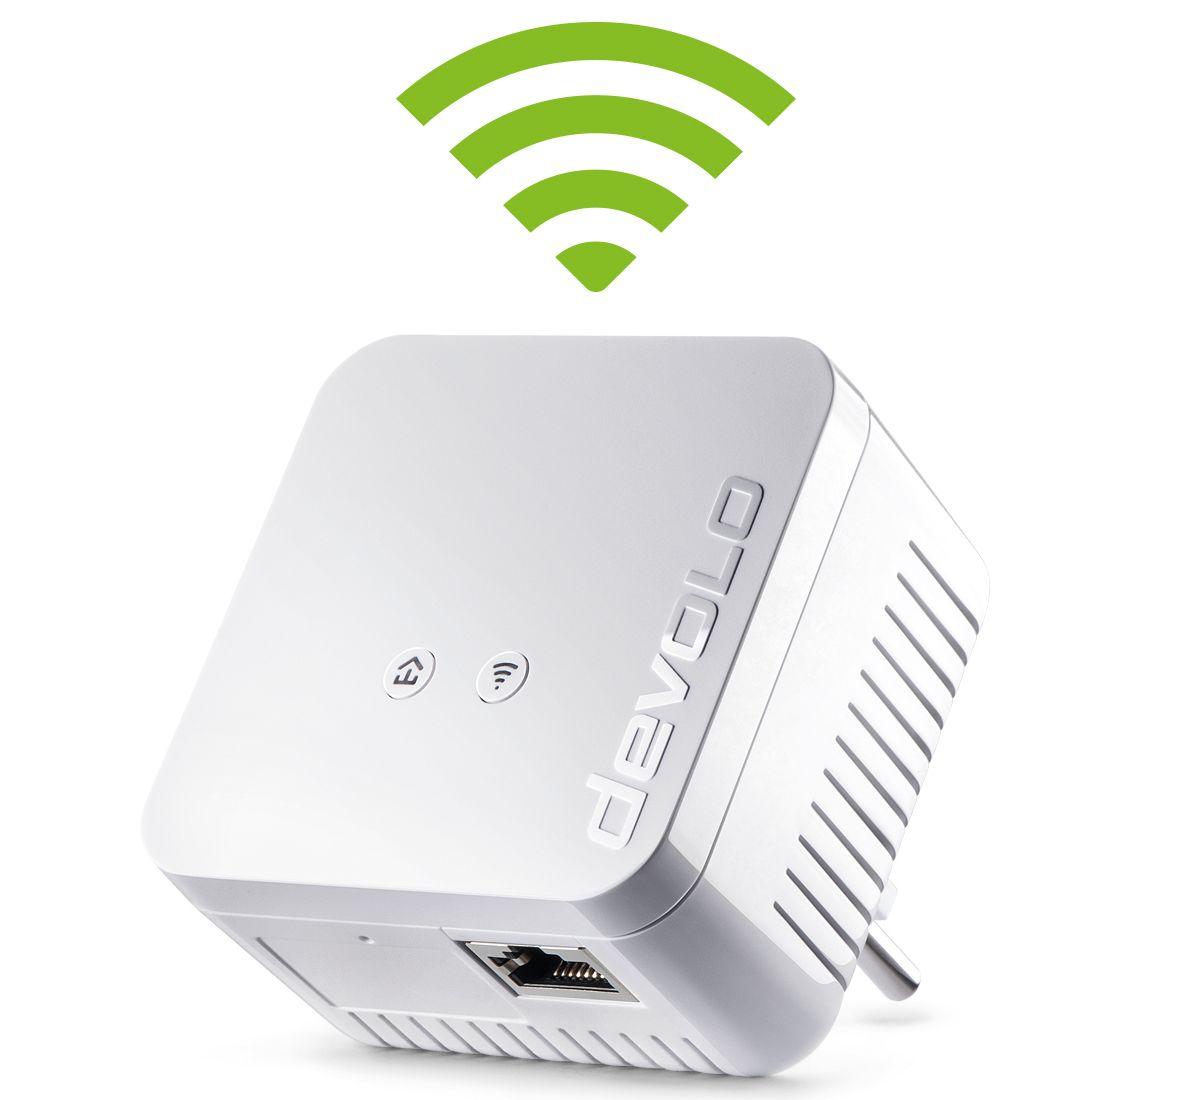 DEVOLO Powerline + WLAN »dLAN 550 WiFi (500Mbit, 1xLAN, Repeater, range+)« 6114e48d1b